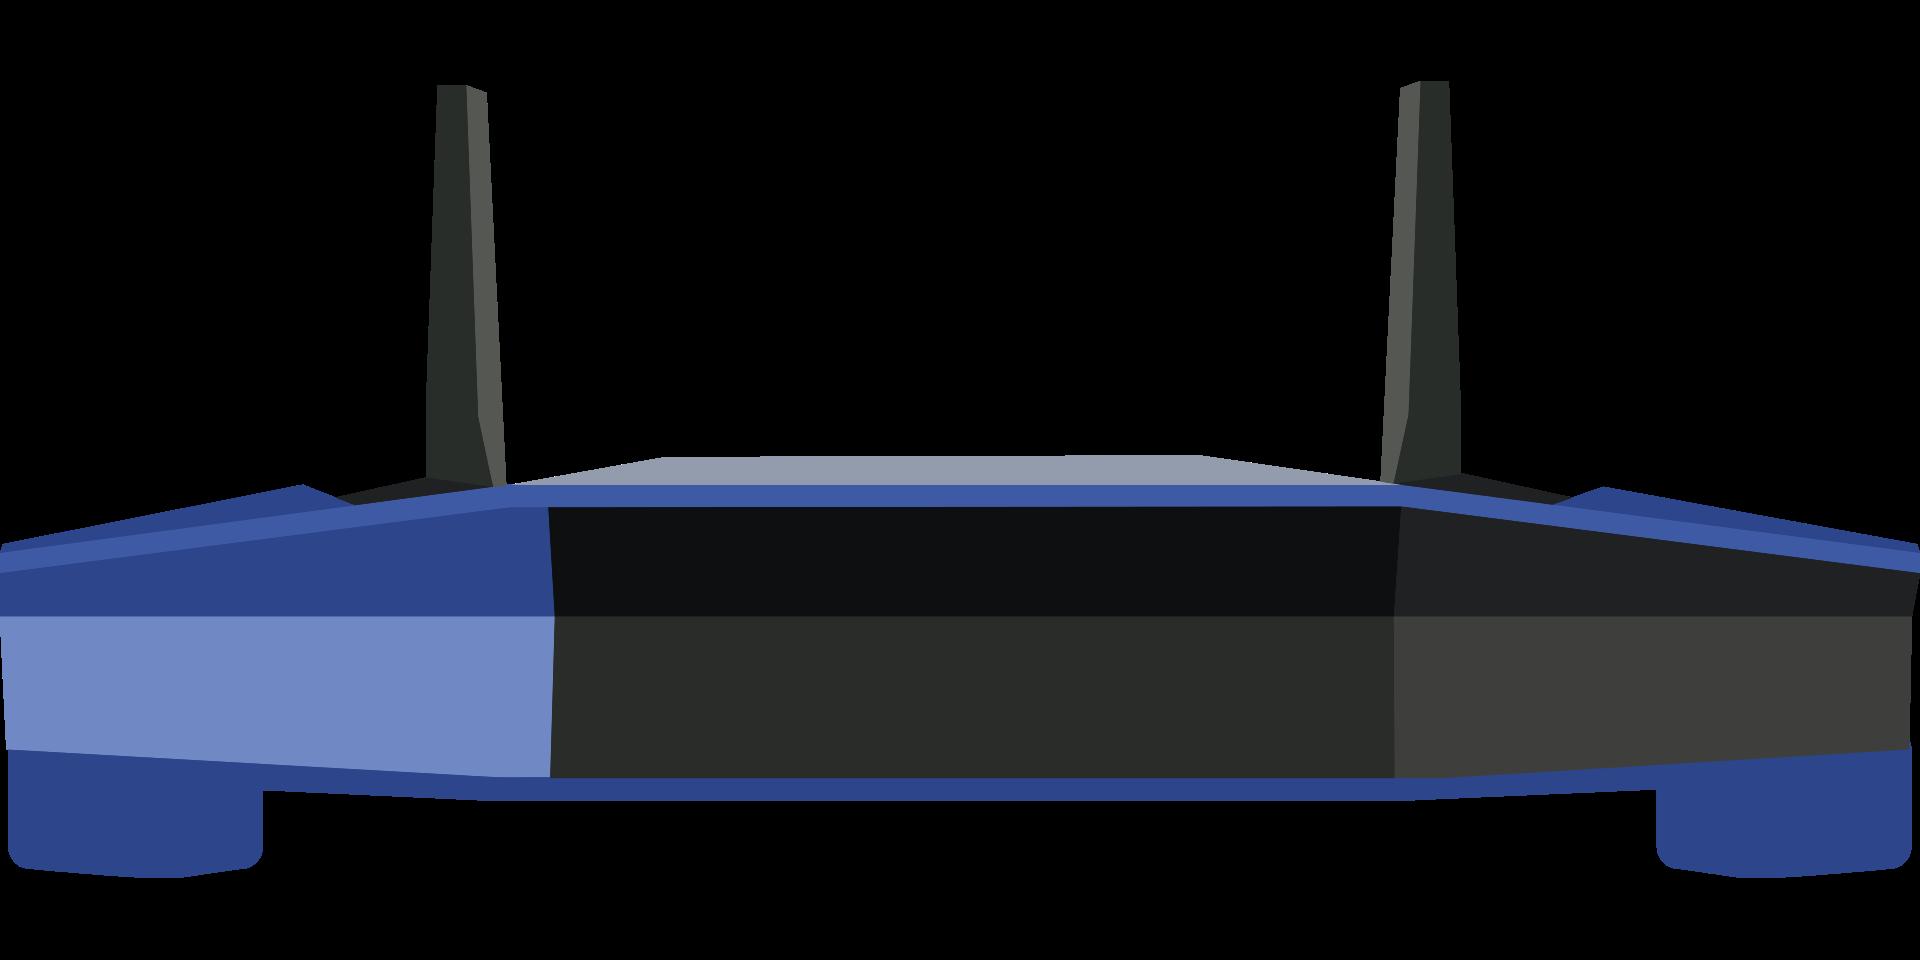 0f82a26238bdf71c7fb6ce884a9baee4 - Best Site To Site Vpn Routers